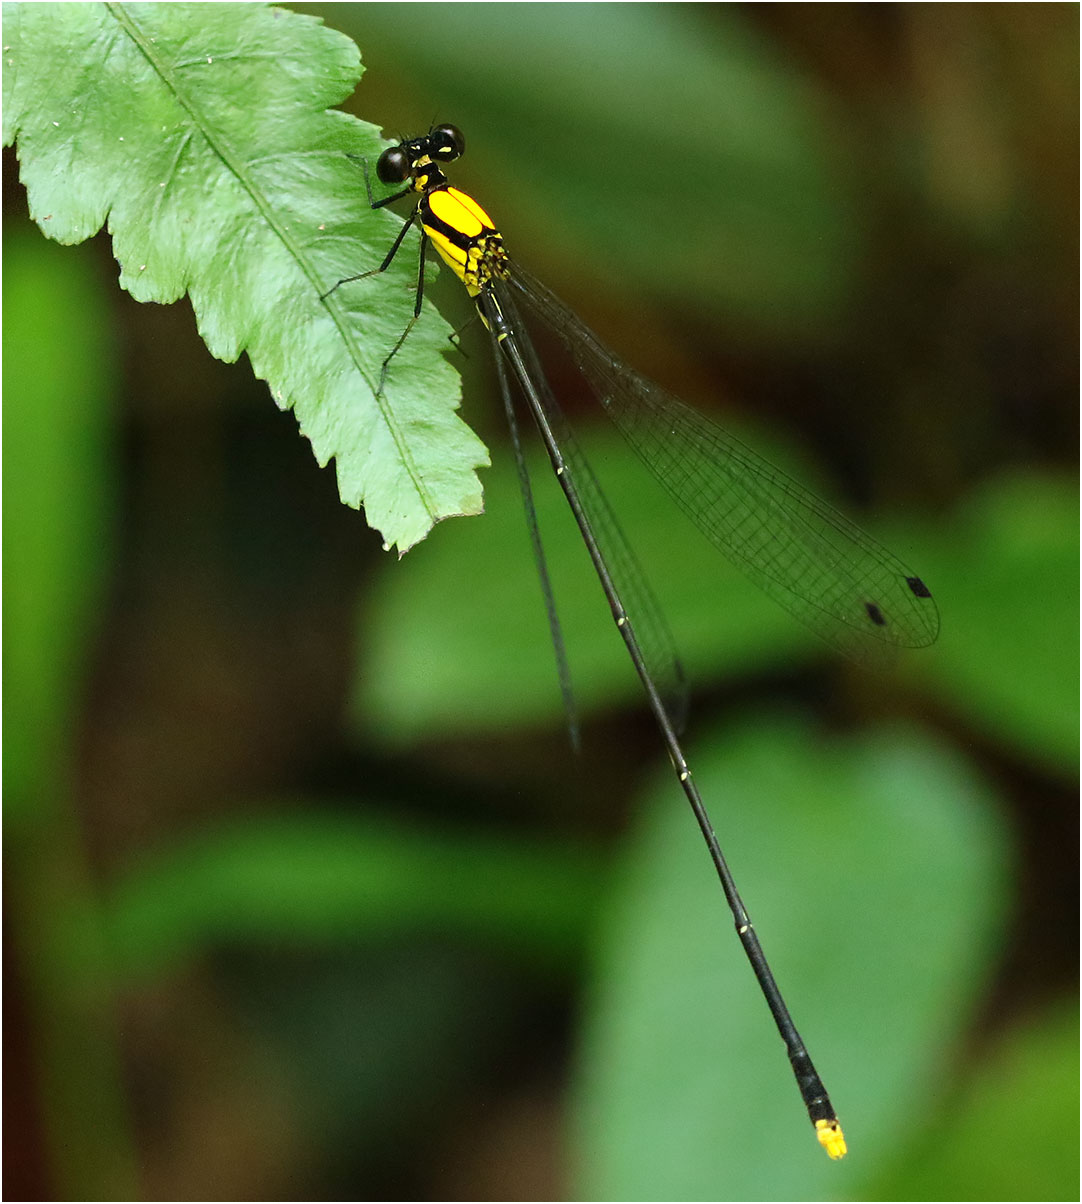 Coeliccia chromothorax mâle, Vietnam, Xuan Son, 09/06/2018